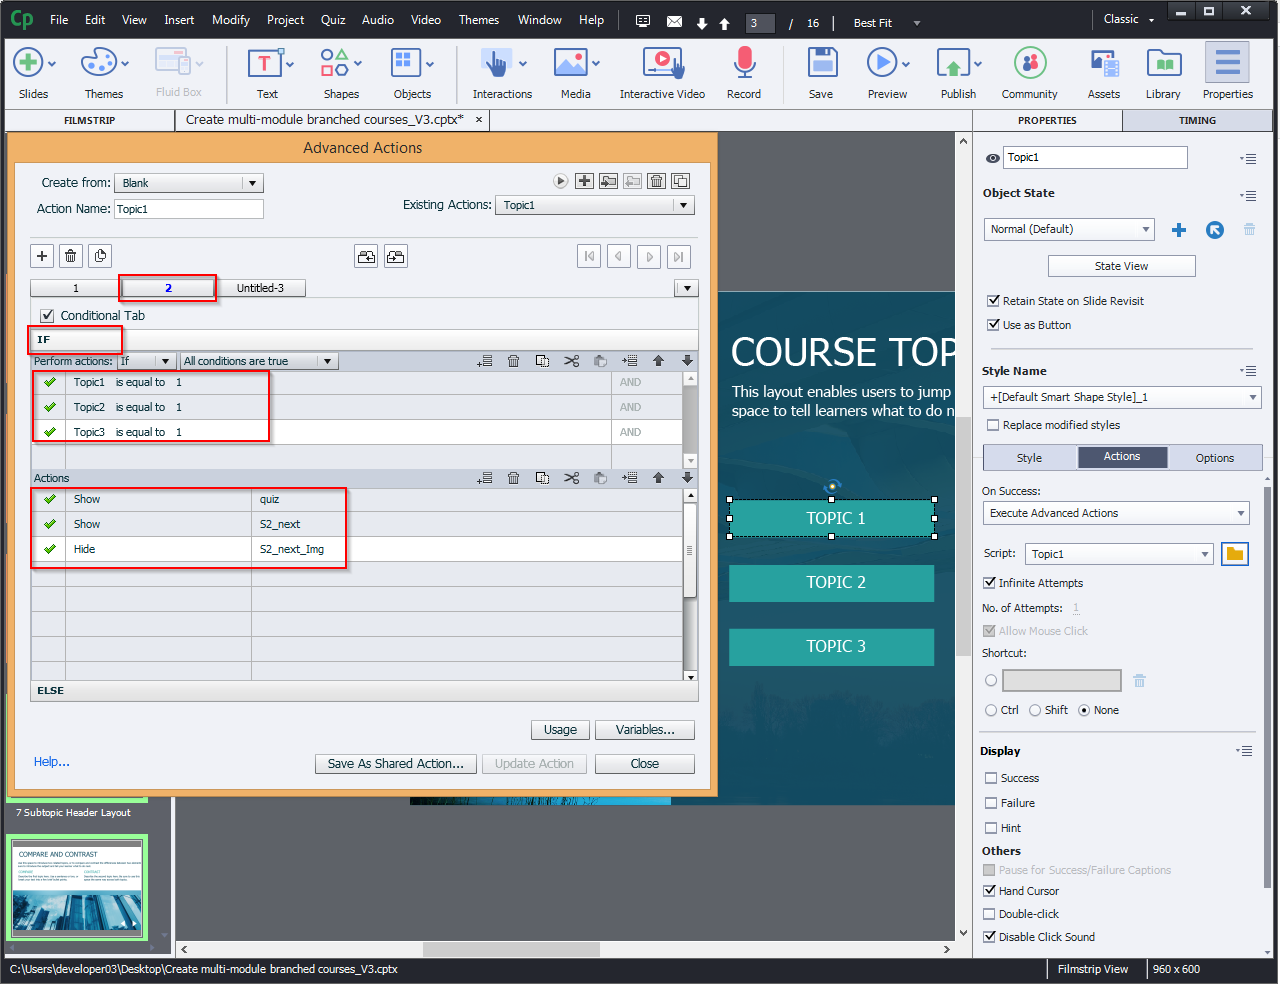 Create multi-module branched courses 10.1